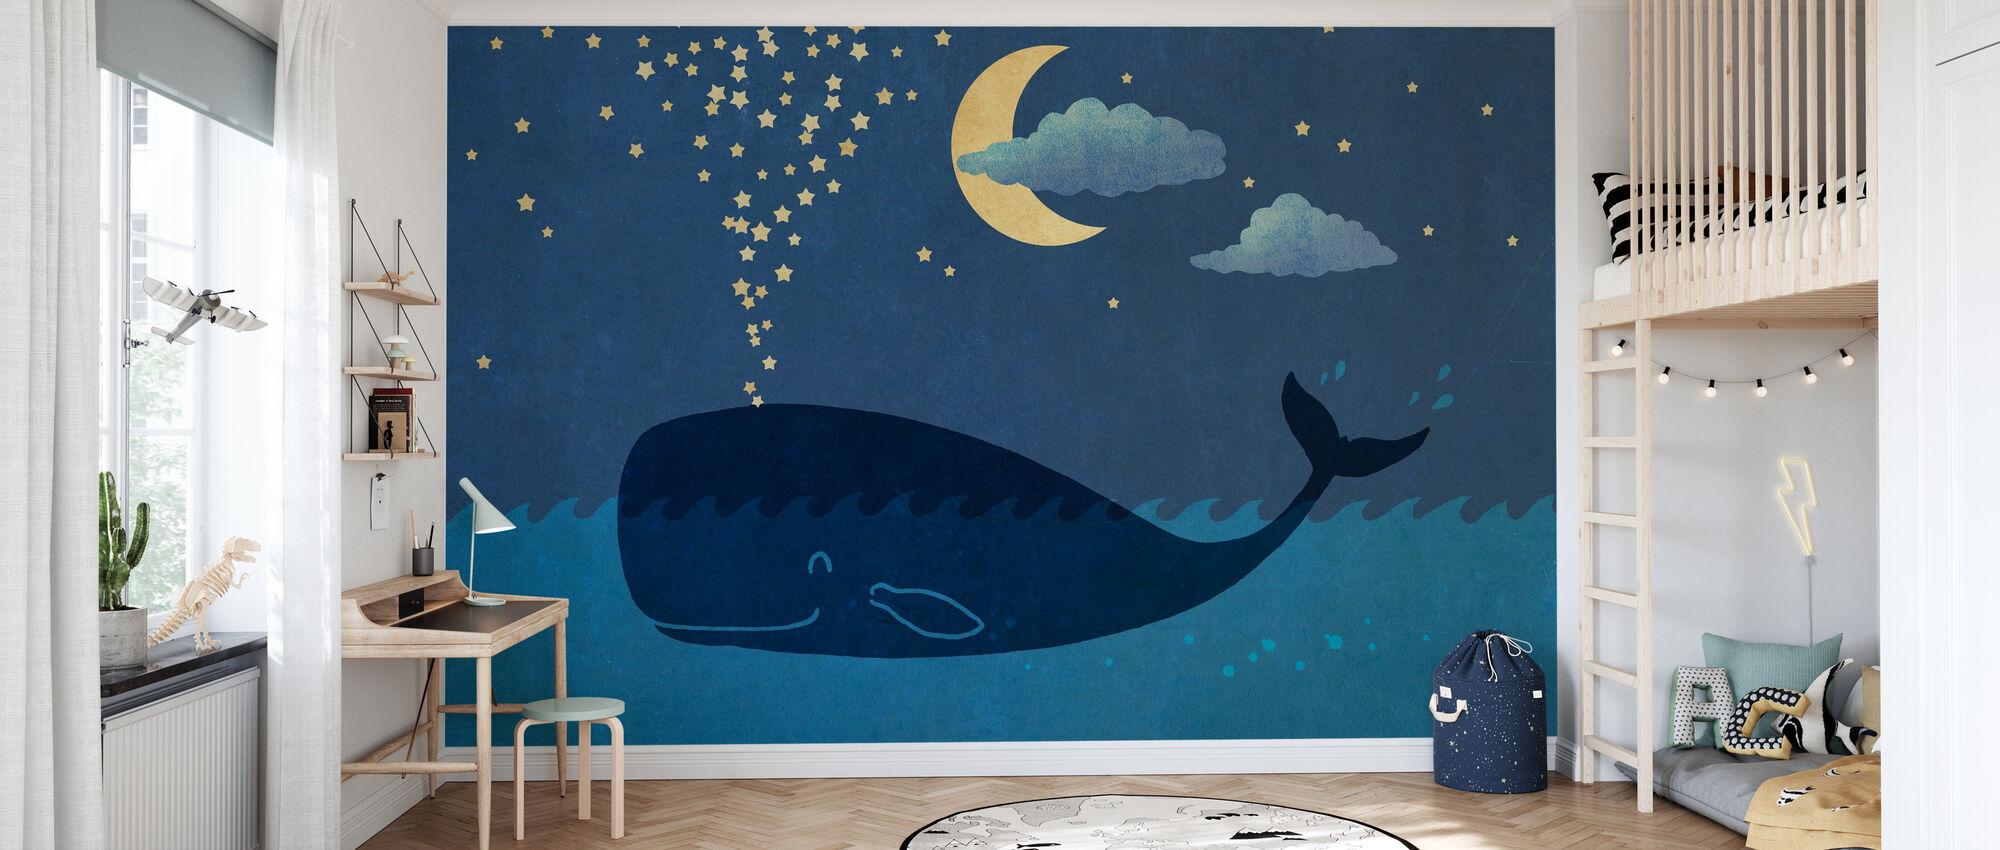 Star Maker - Wallpaper - Kids Room